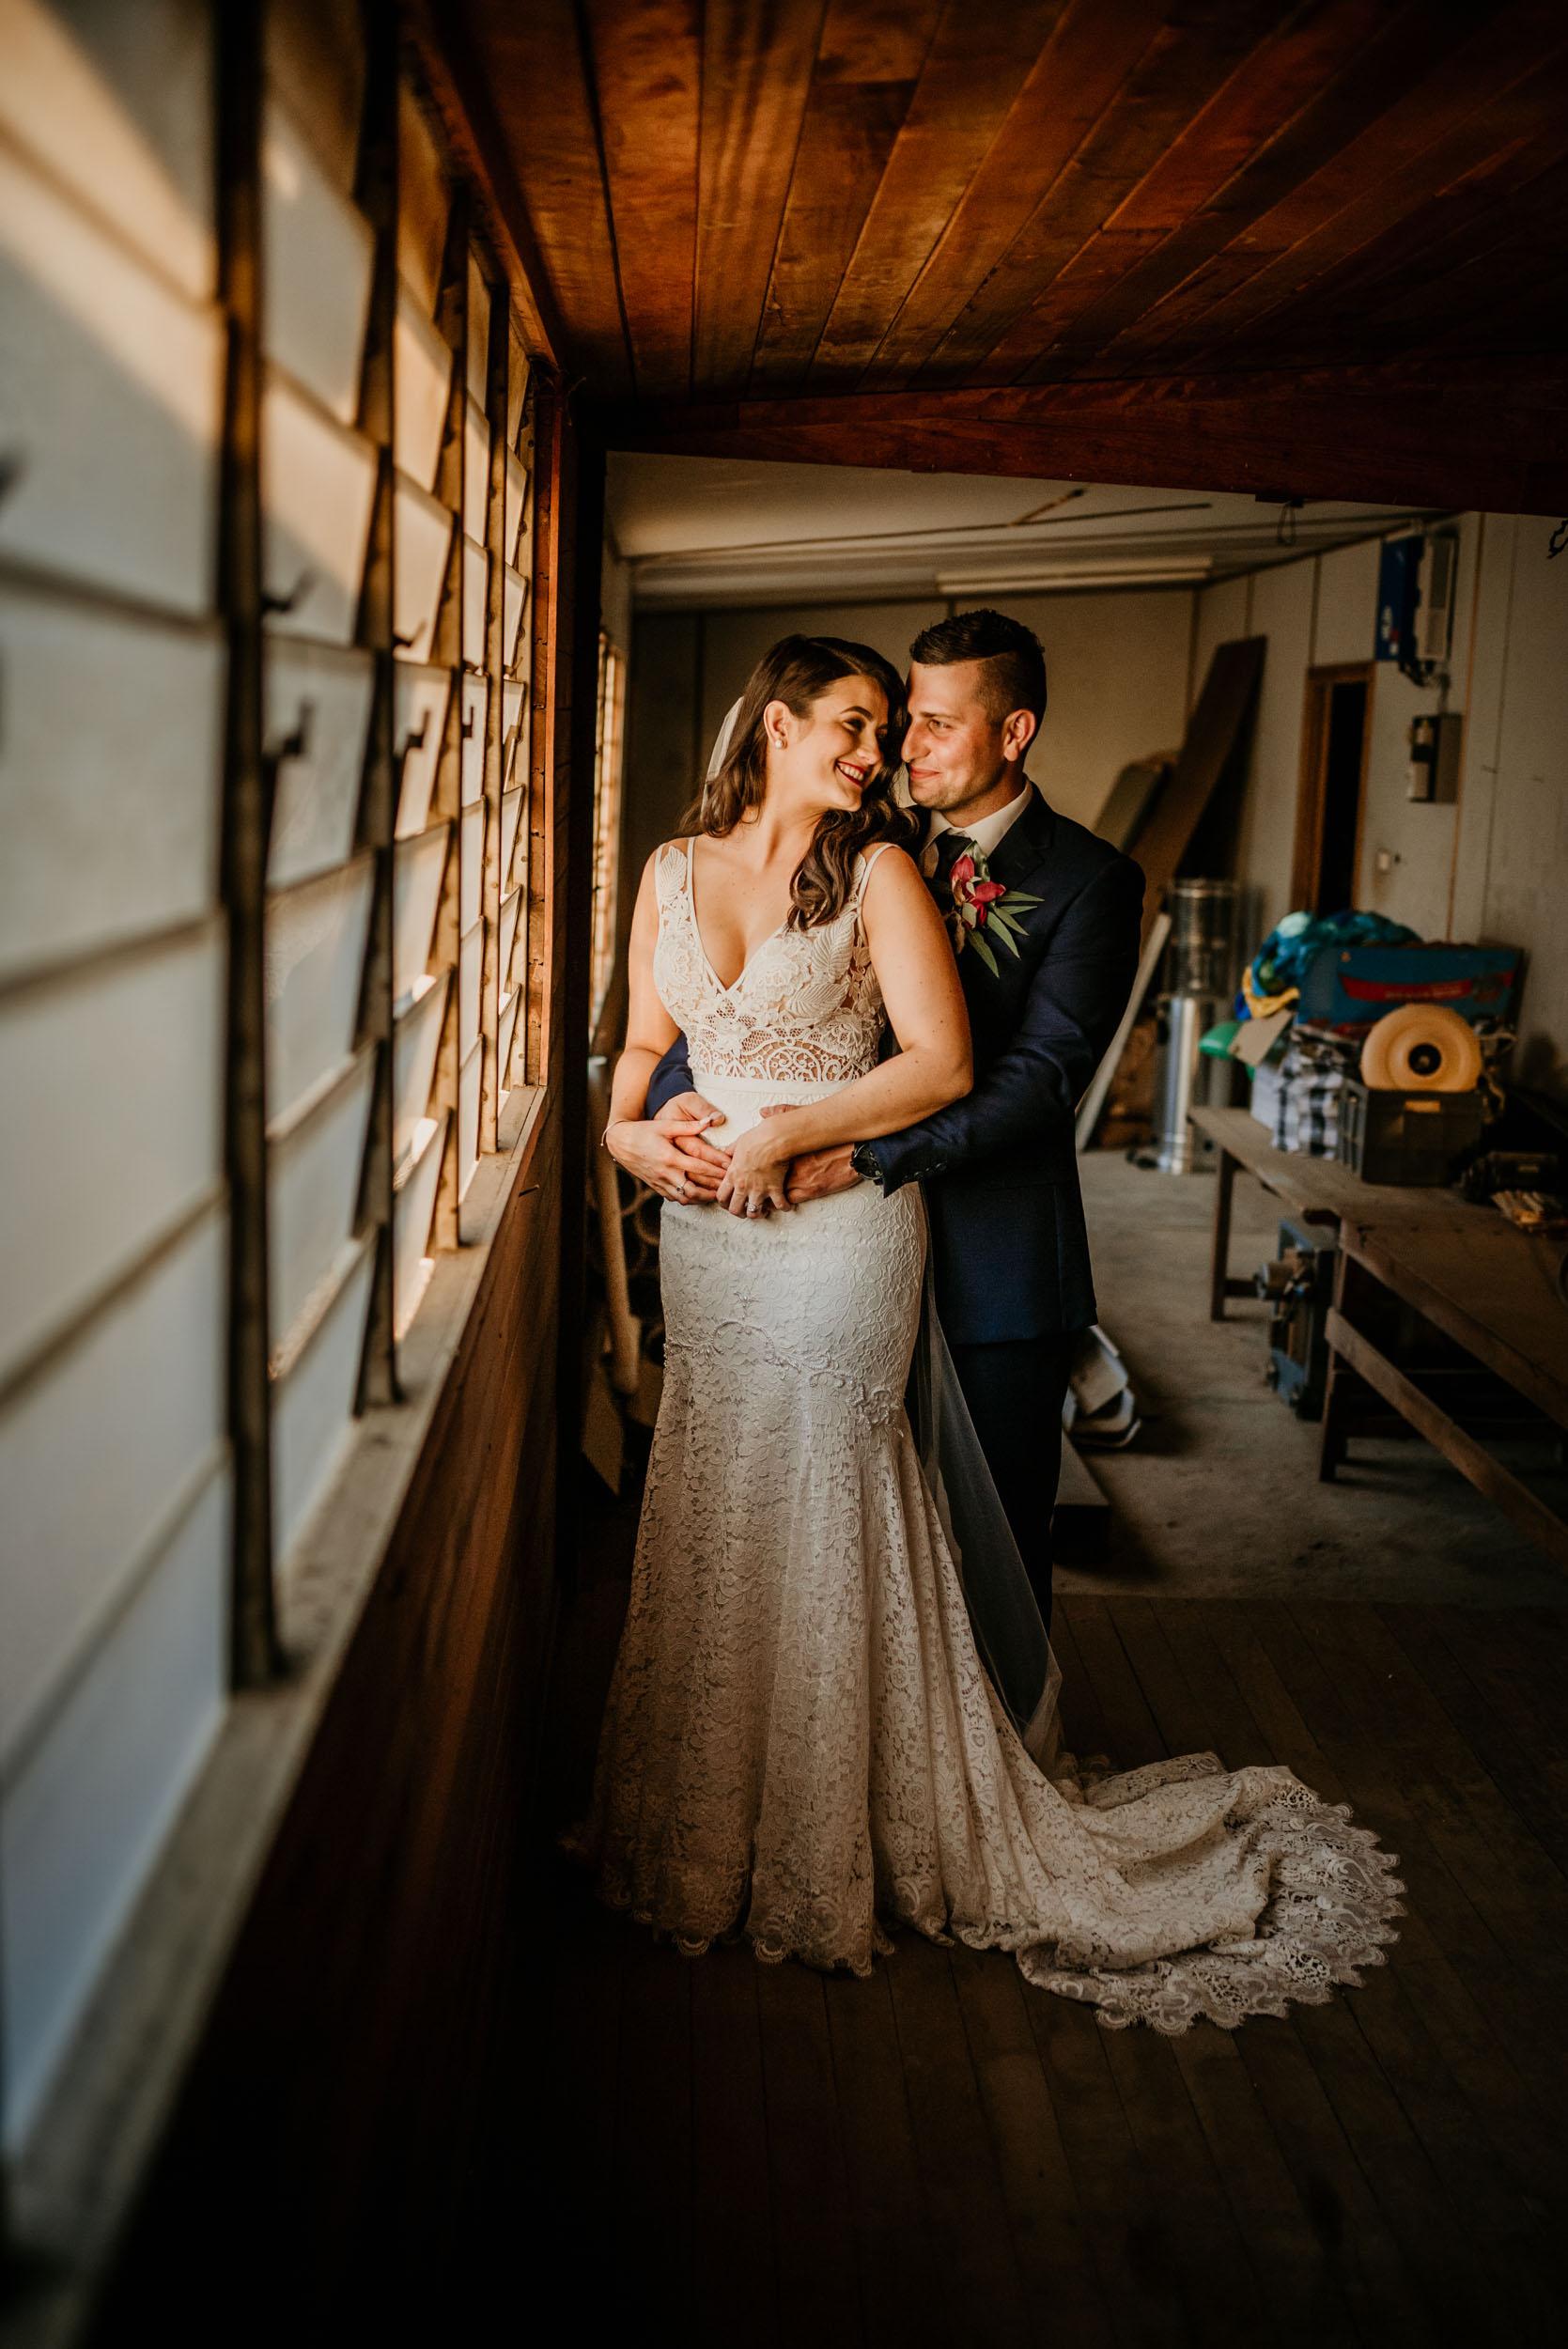 The Raw Photographer - Cairns and Port Douglas Wedding Photographer - Best of 2018-38.jpg